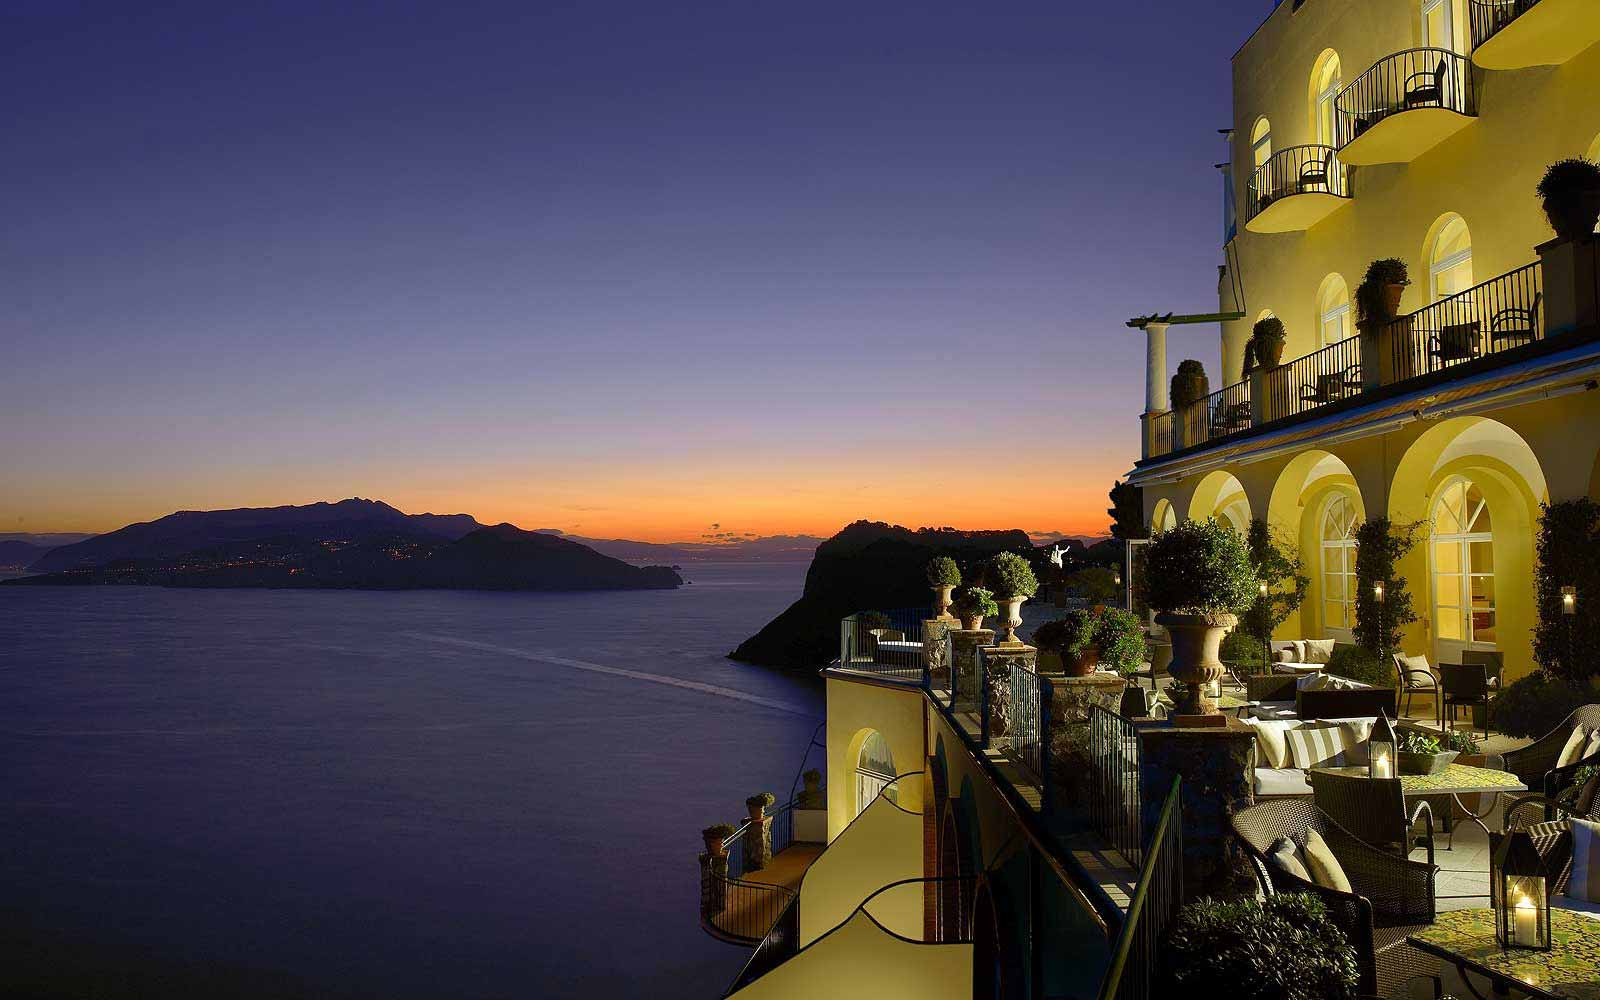 Hotel Caesar Augustus' terrace at night